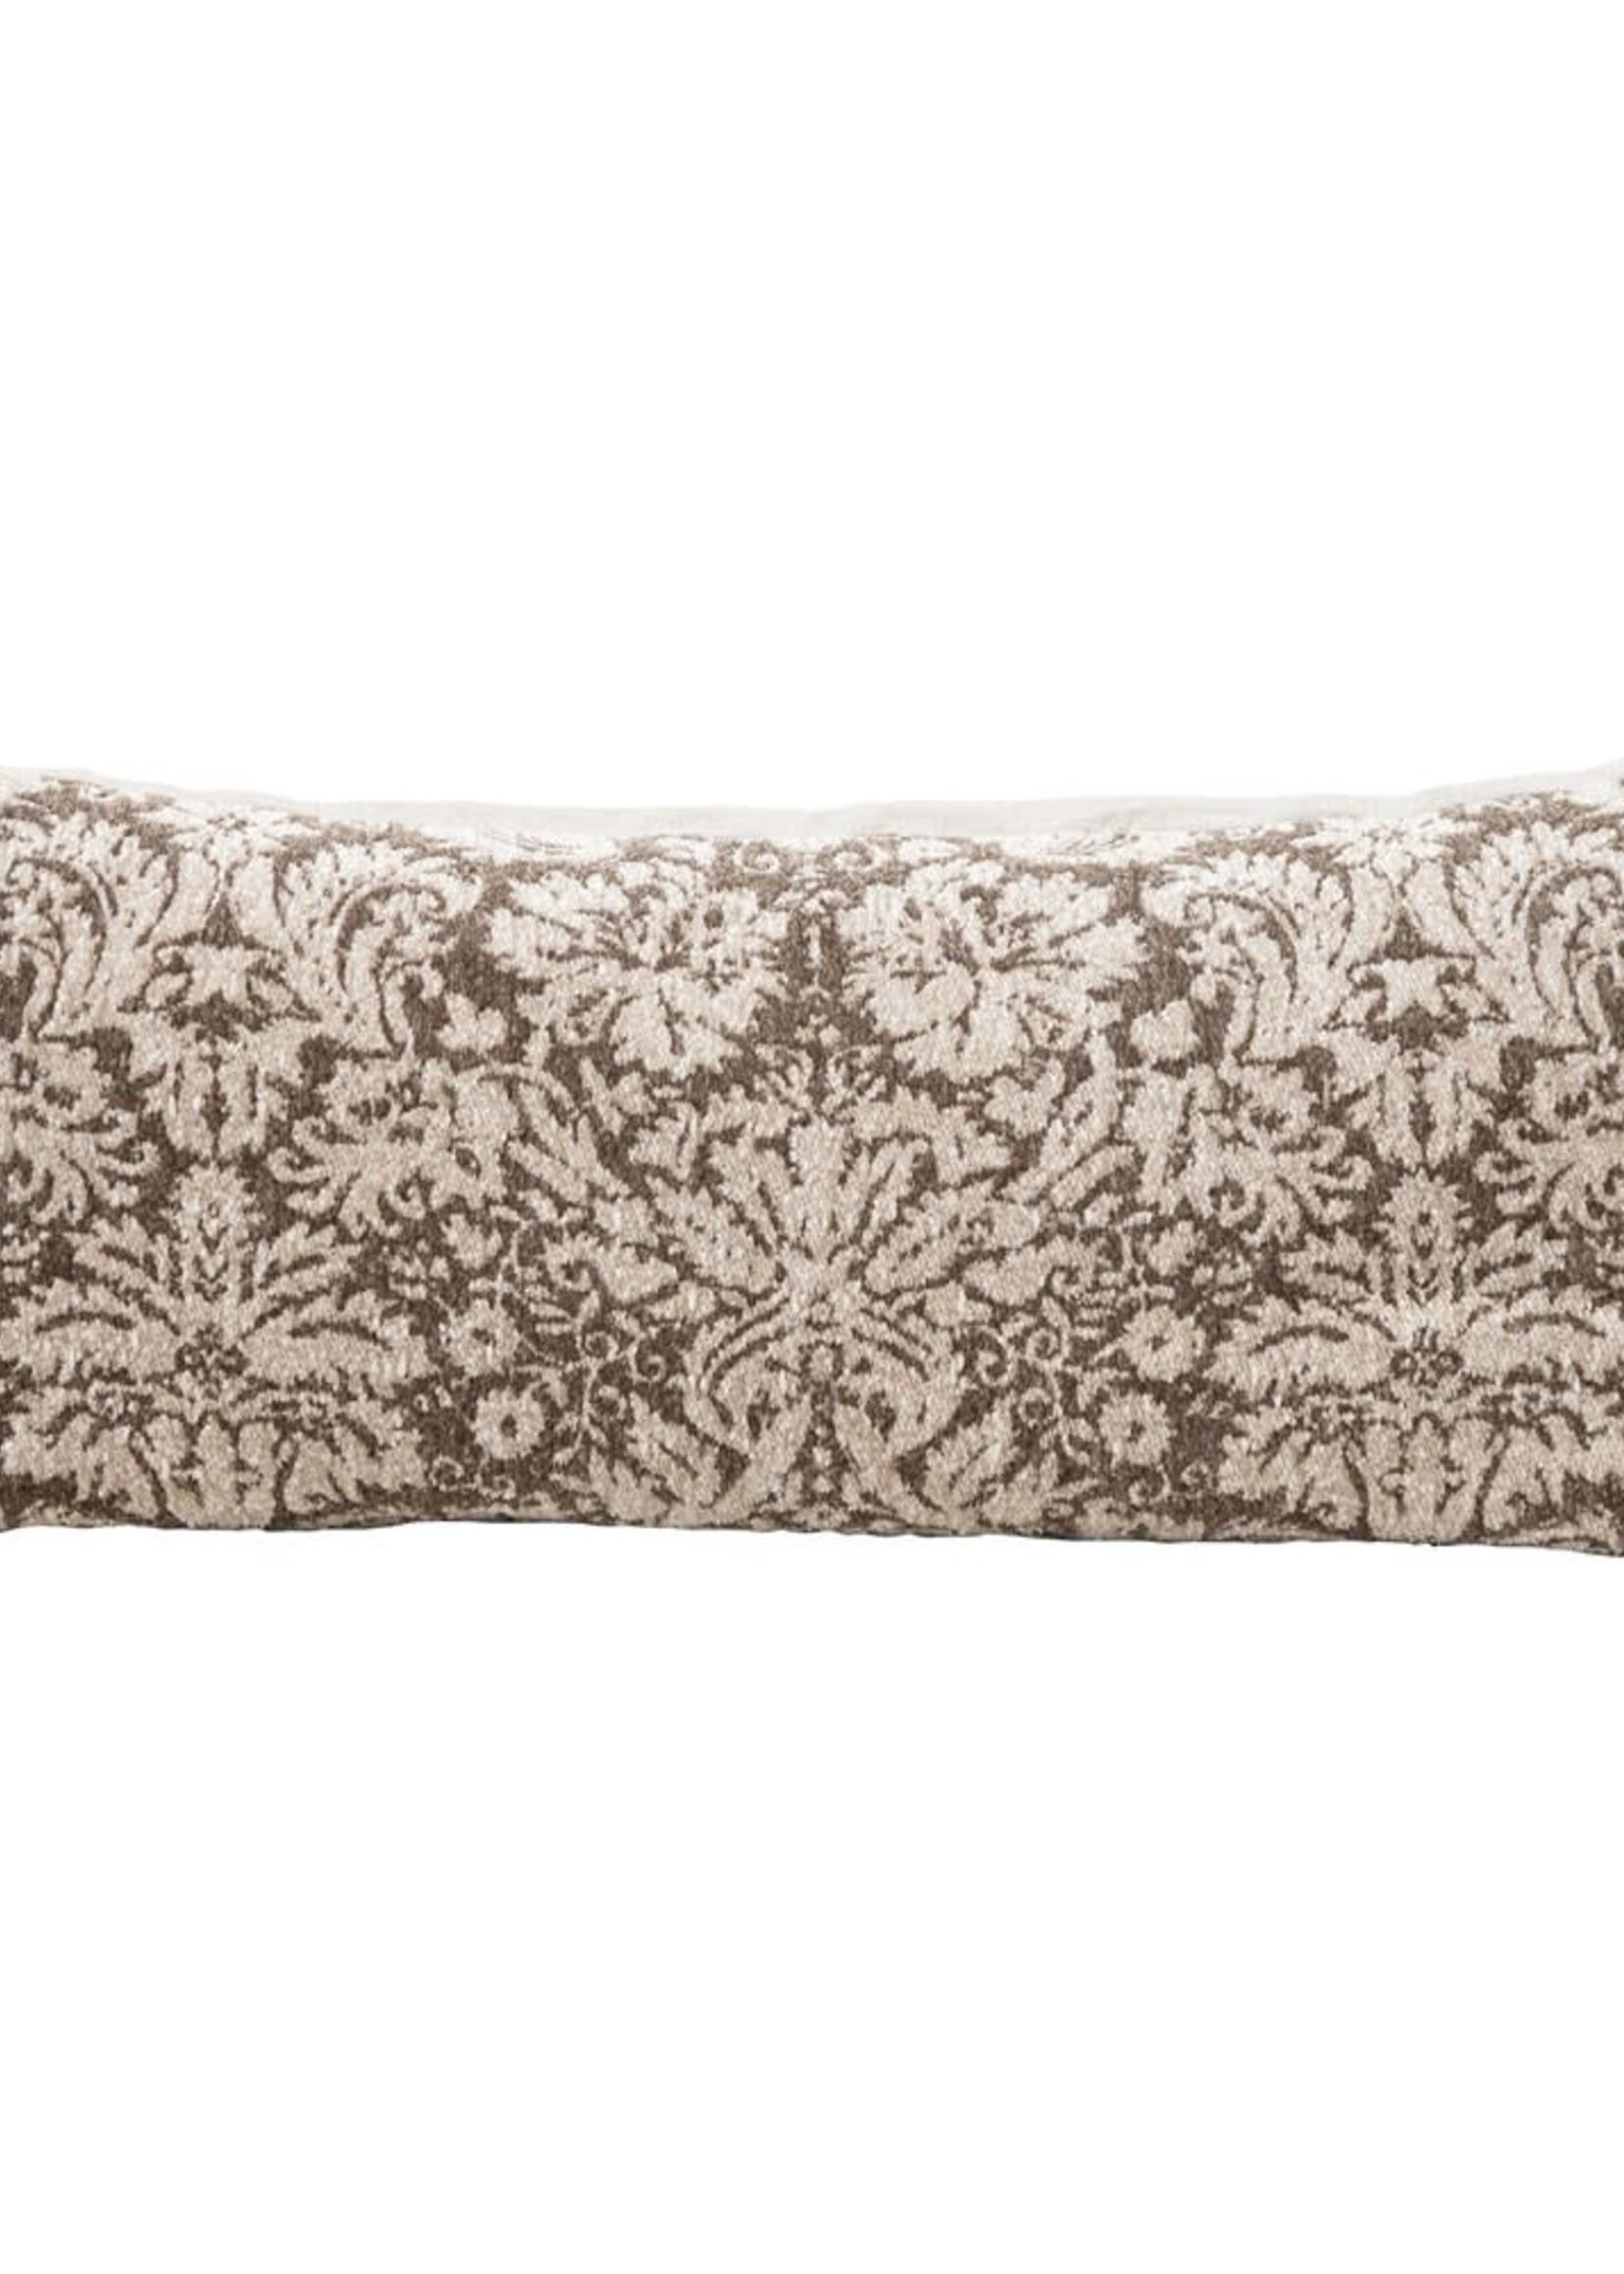 "36""L x 16""W Polyester Lumbar Pillow, Brown & Cream Color"